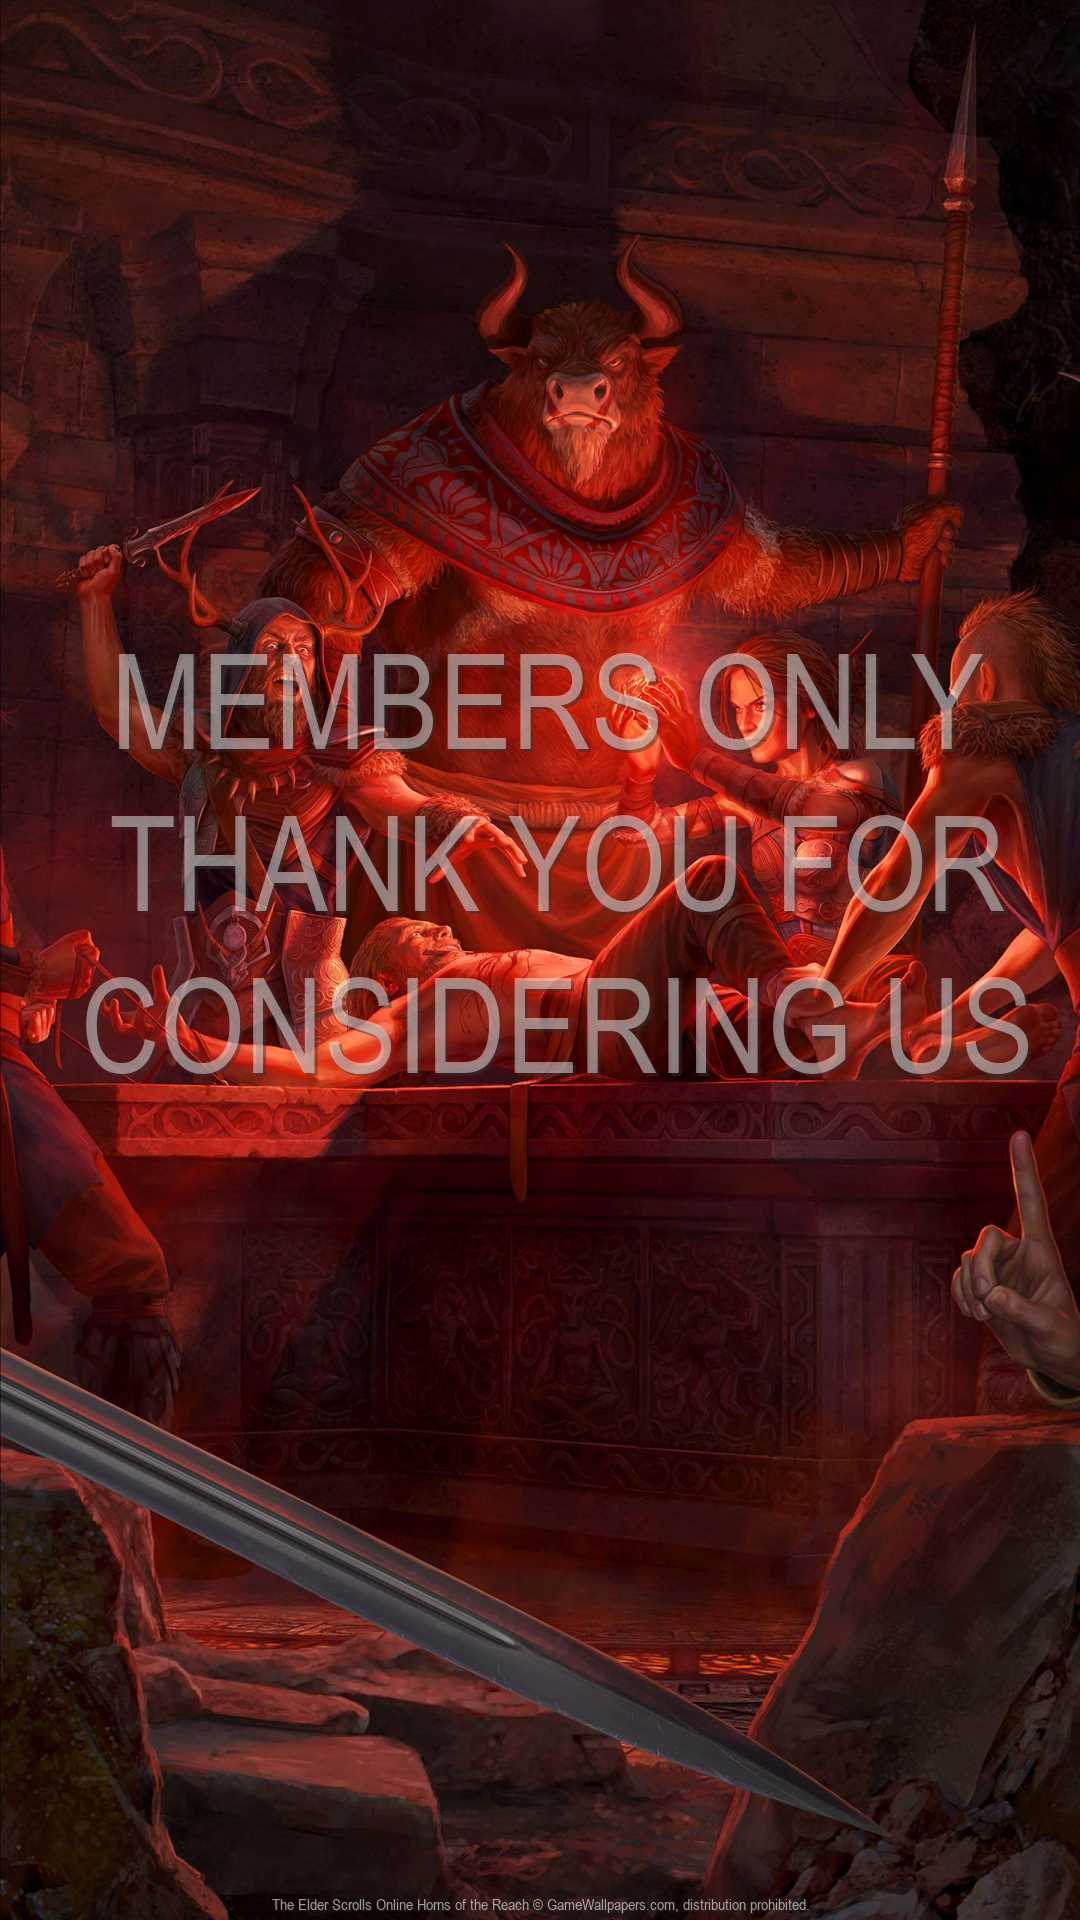 The Elder Scrolls Online: Horns of the Reach 1080p Vertical Mobile wallpaper or background 01